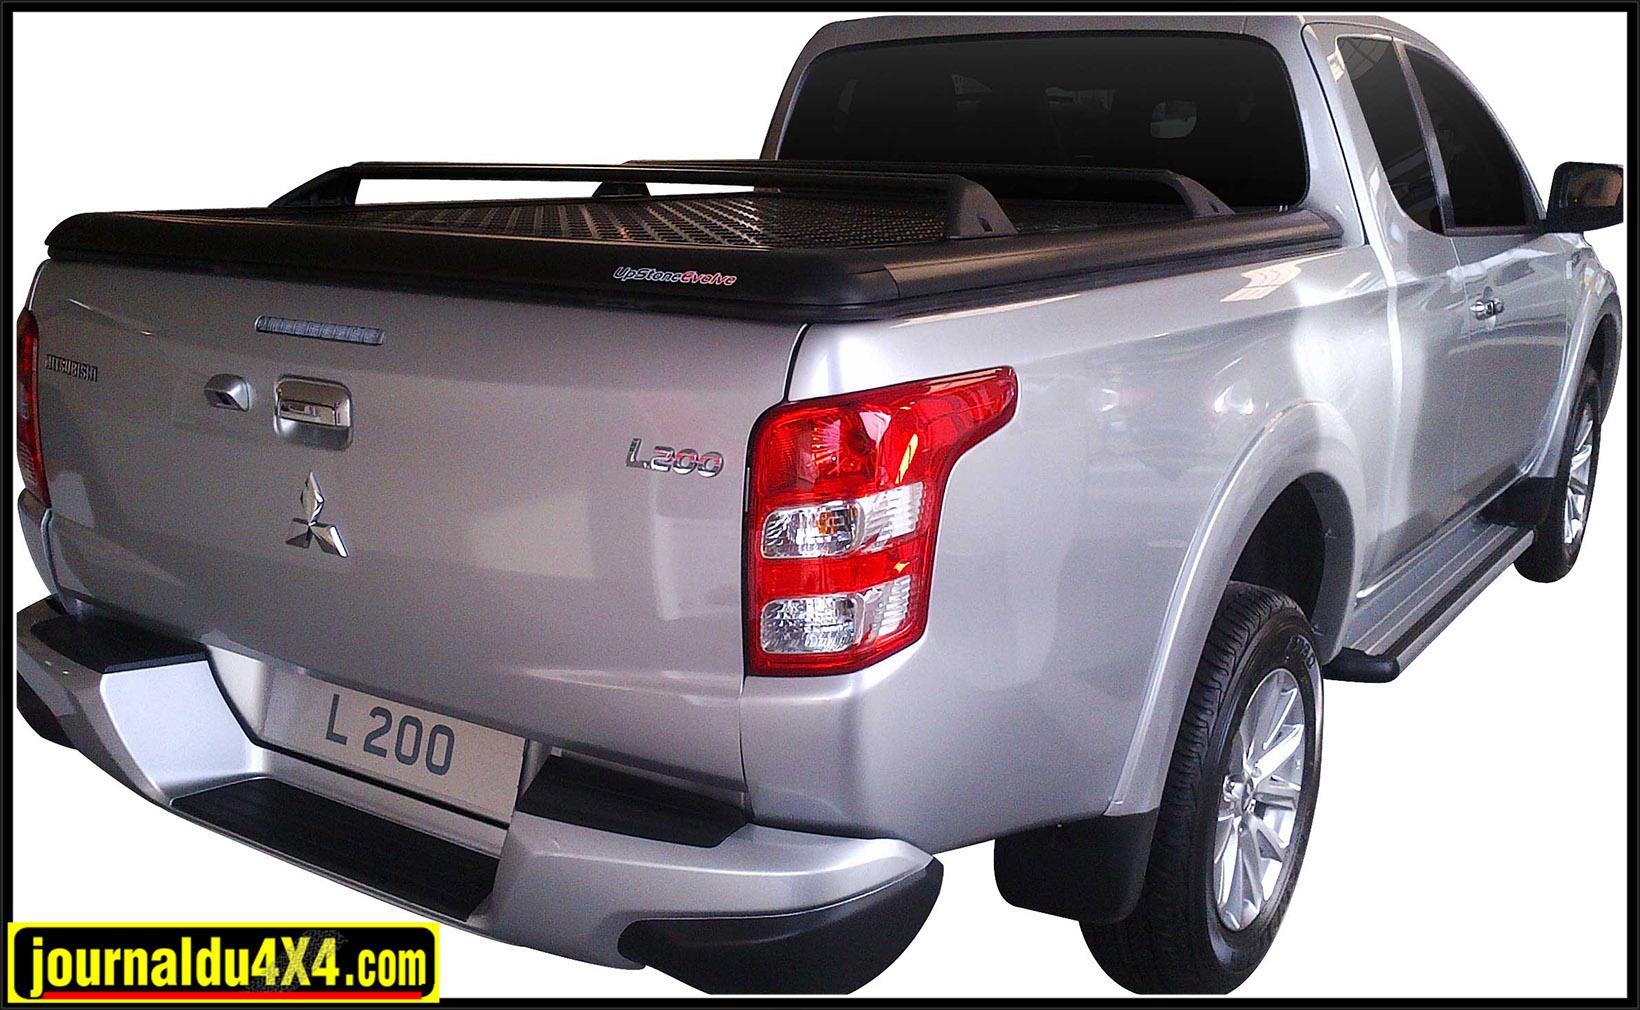 l200-pickup-tonneau-cover-marina4x4.jpg